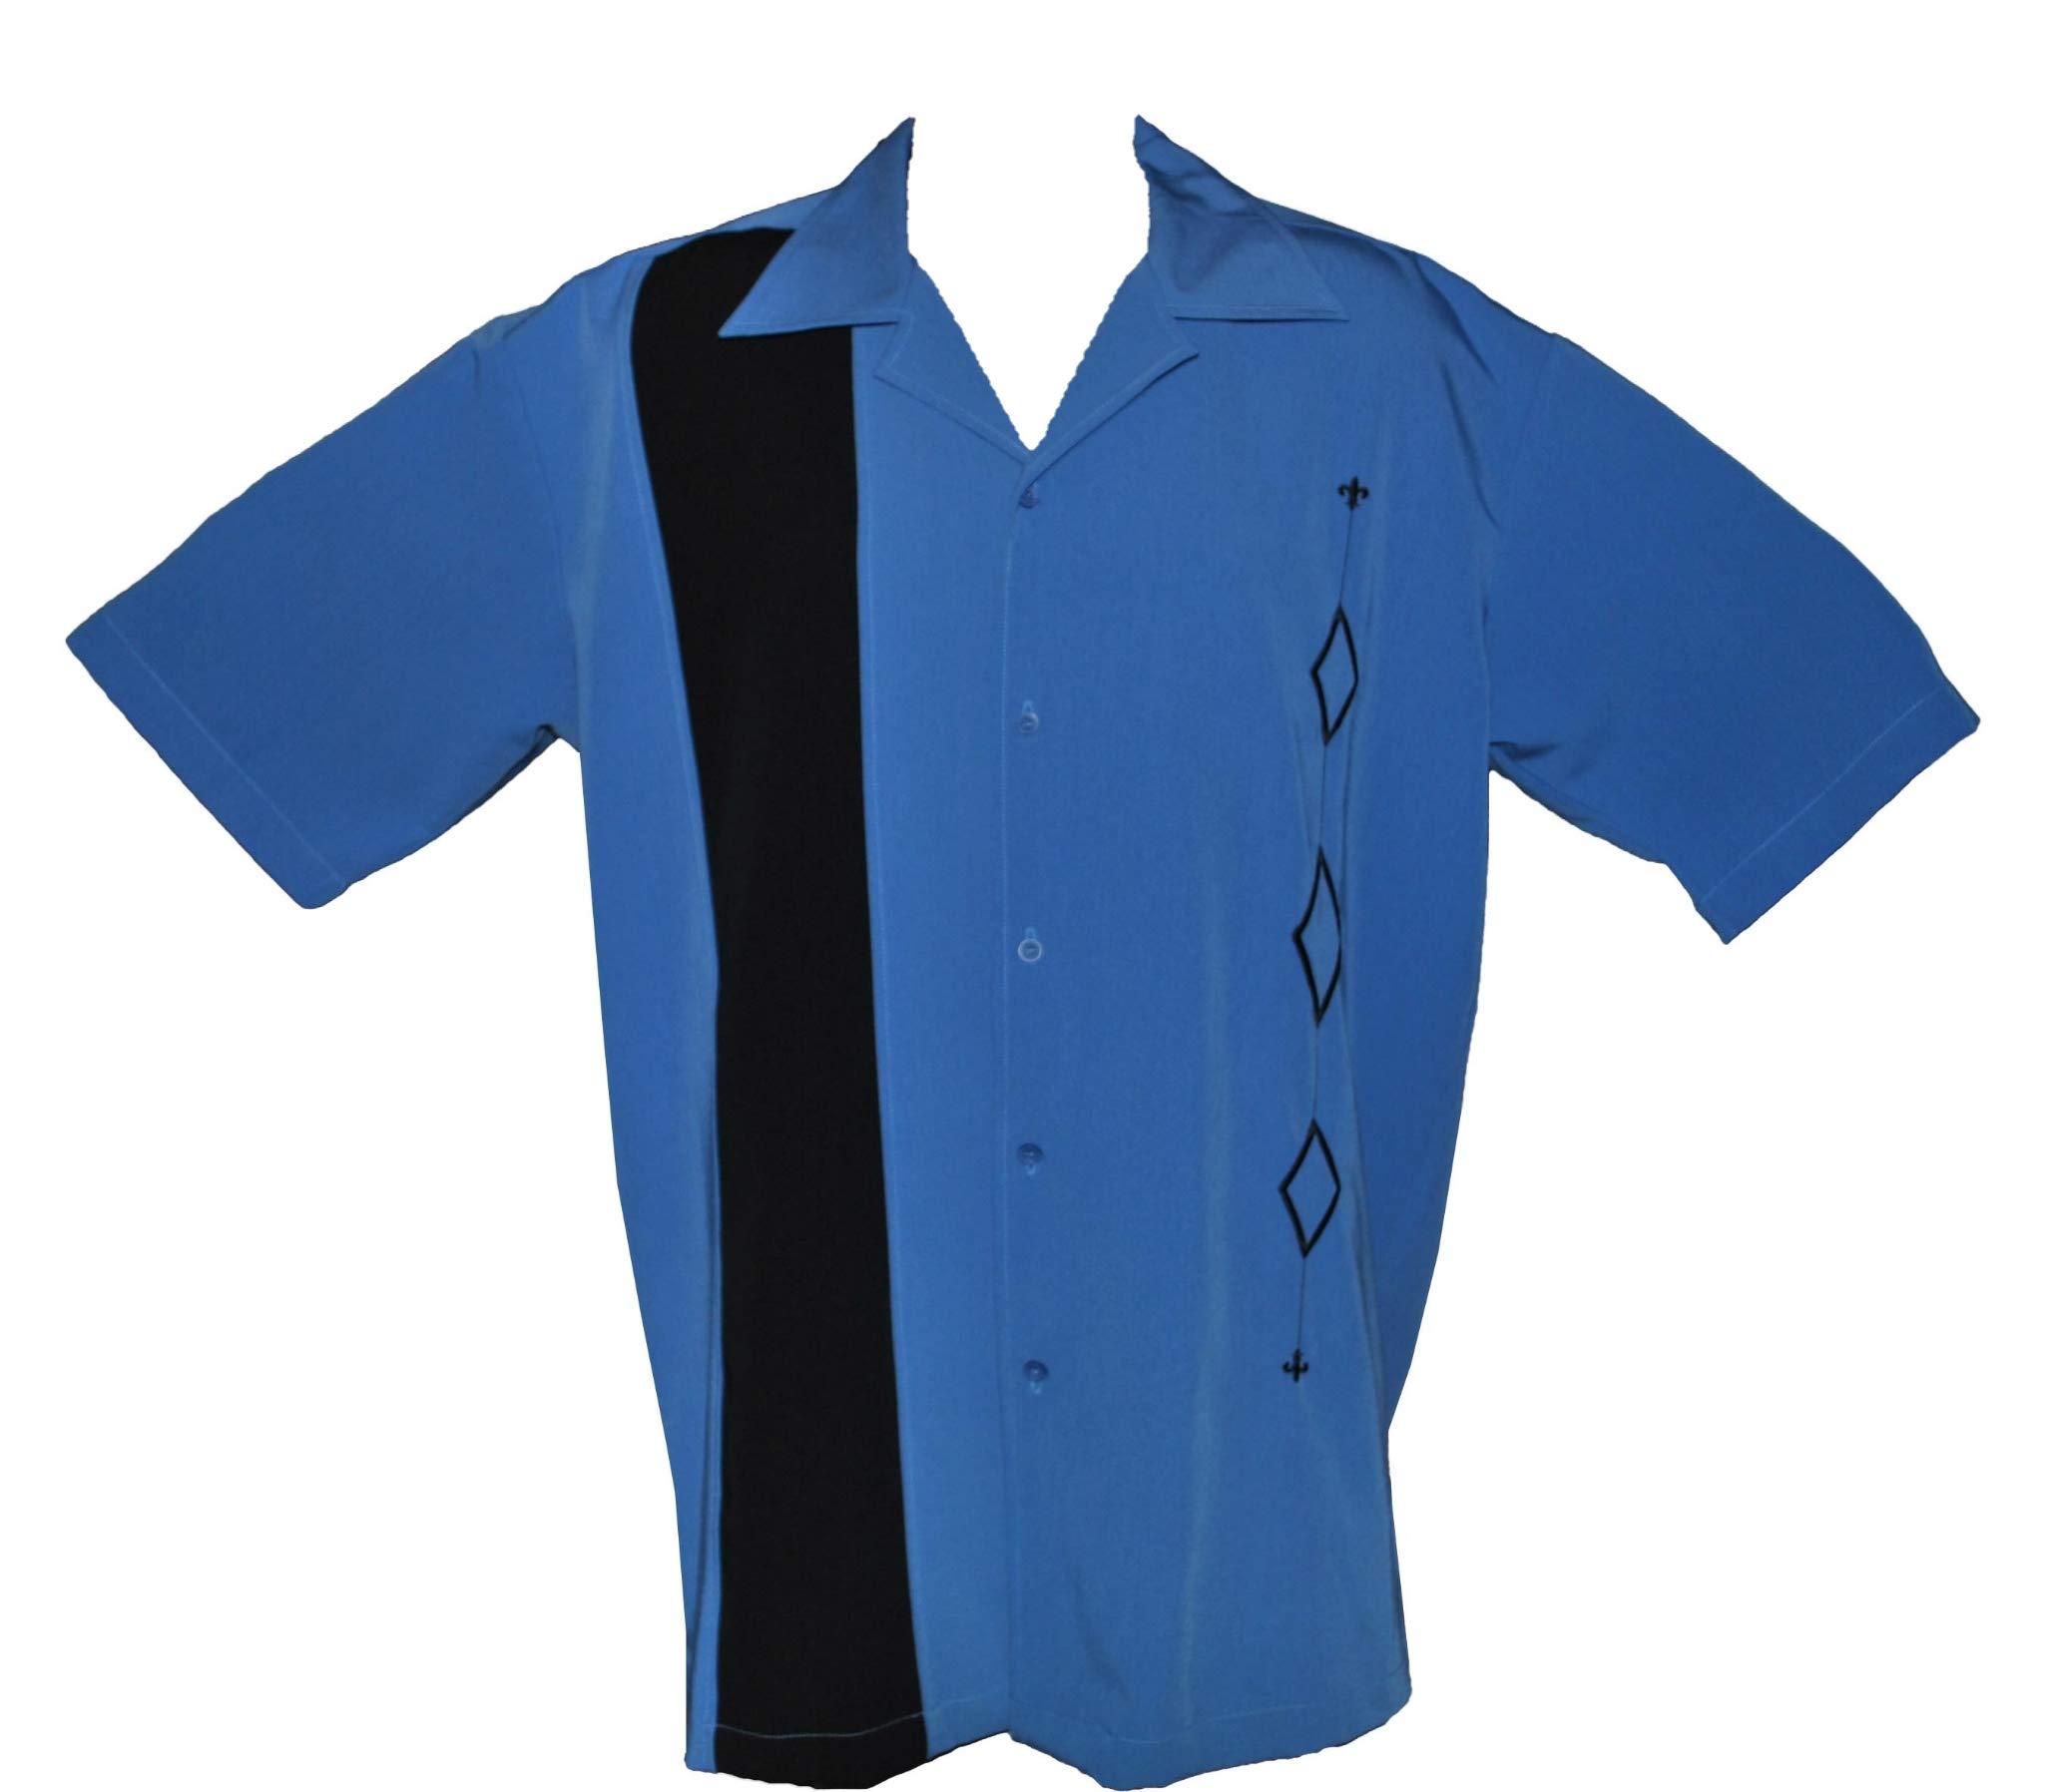 Designs by Attila Retro Bowling Shirt, Big & Tall Sizes. Mens Alaska Blue Casual Shirt, Size XL-Tall by Designs by Attila